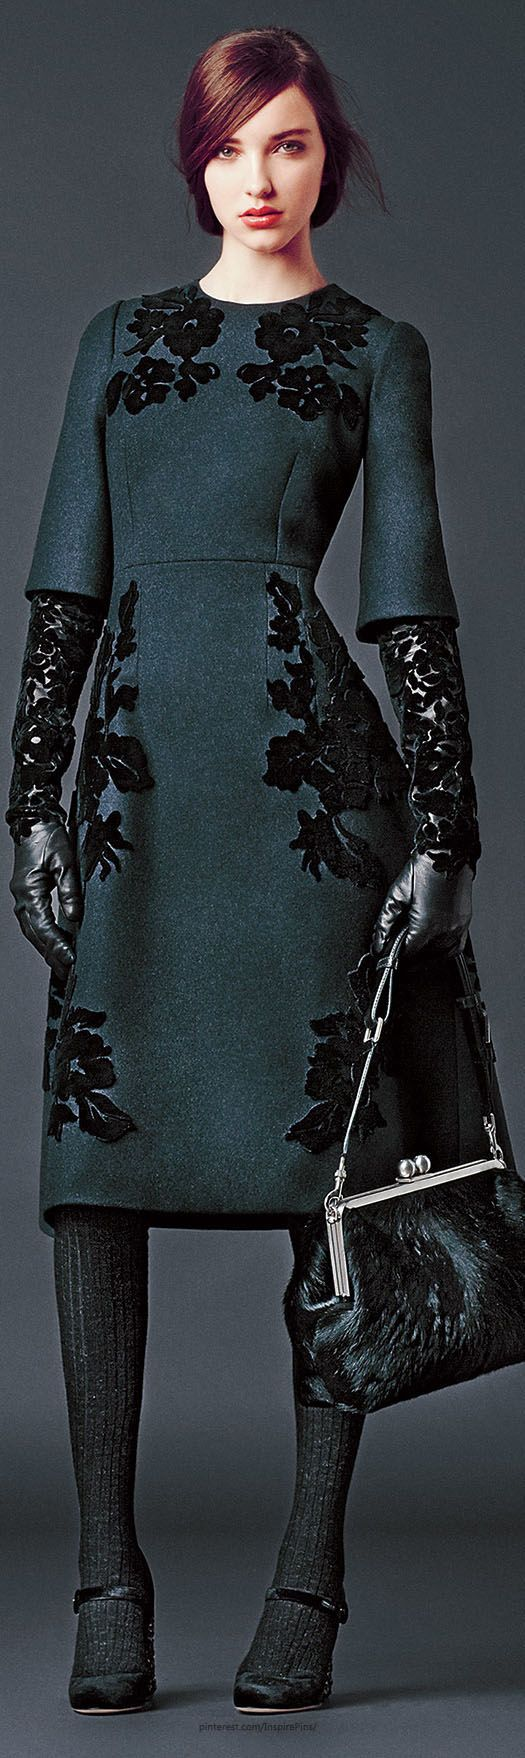 #Modest doesn't mean frumpy. #DressingWithDignity www.ColleenHammond.com Dolce & Gabbana